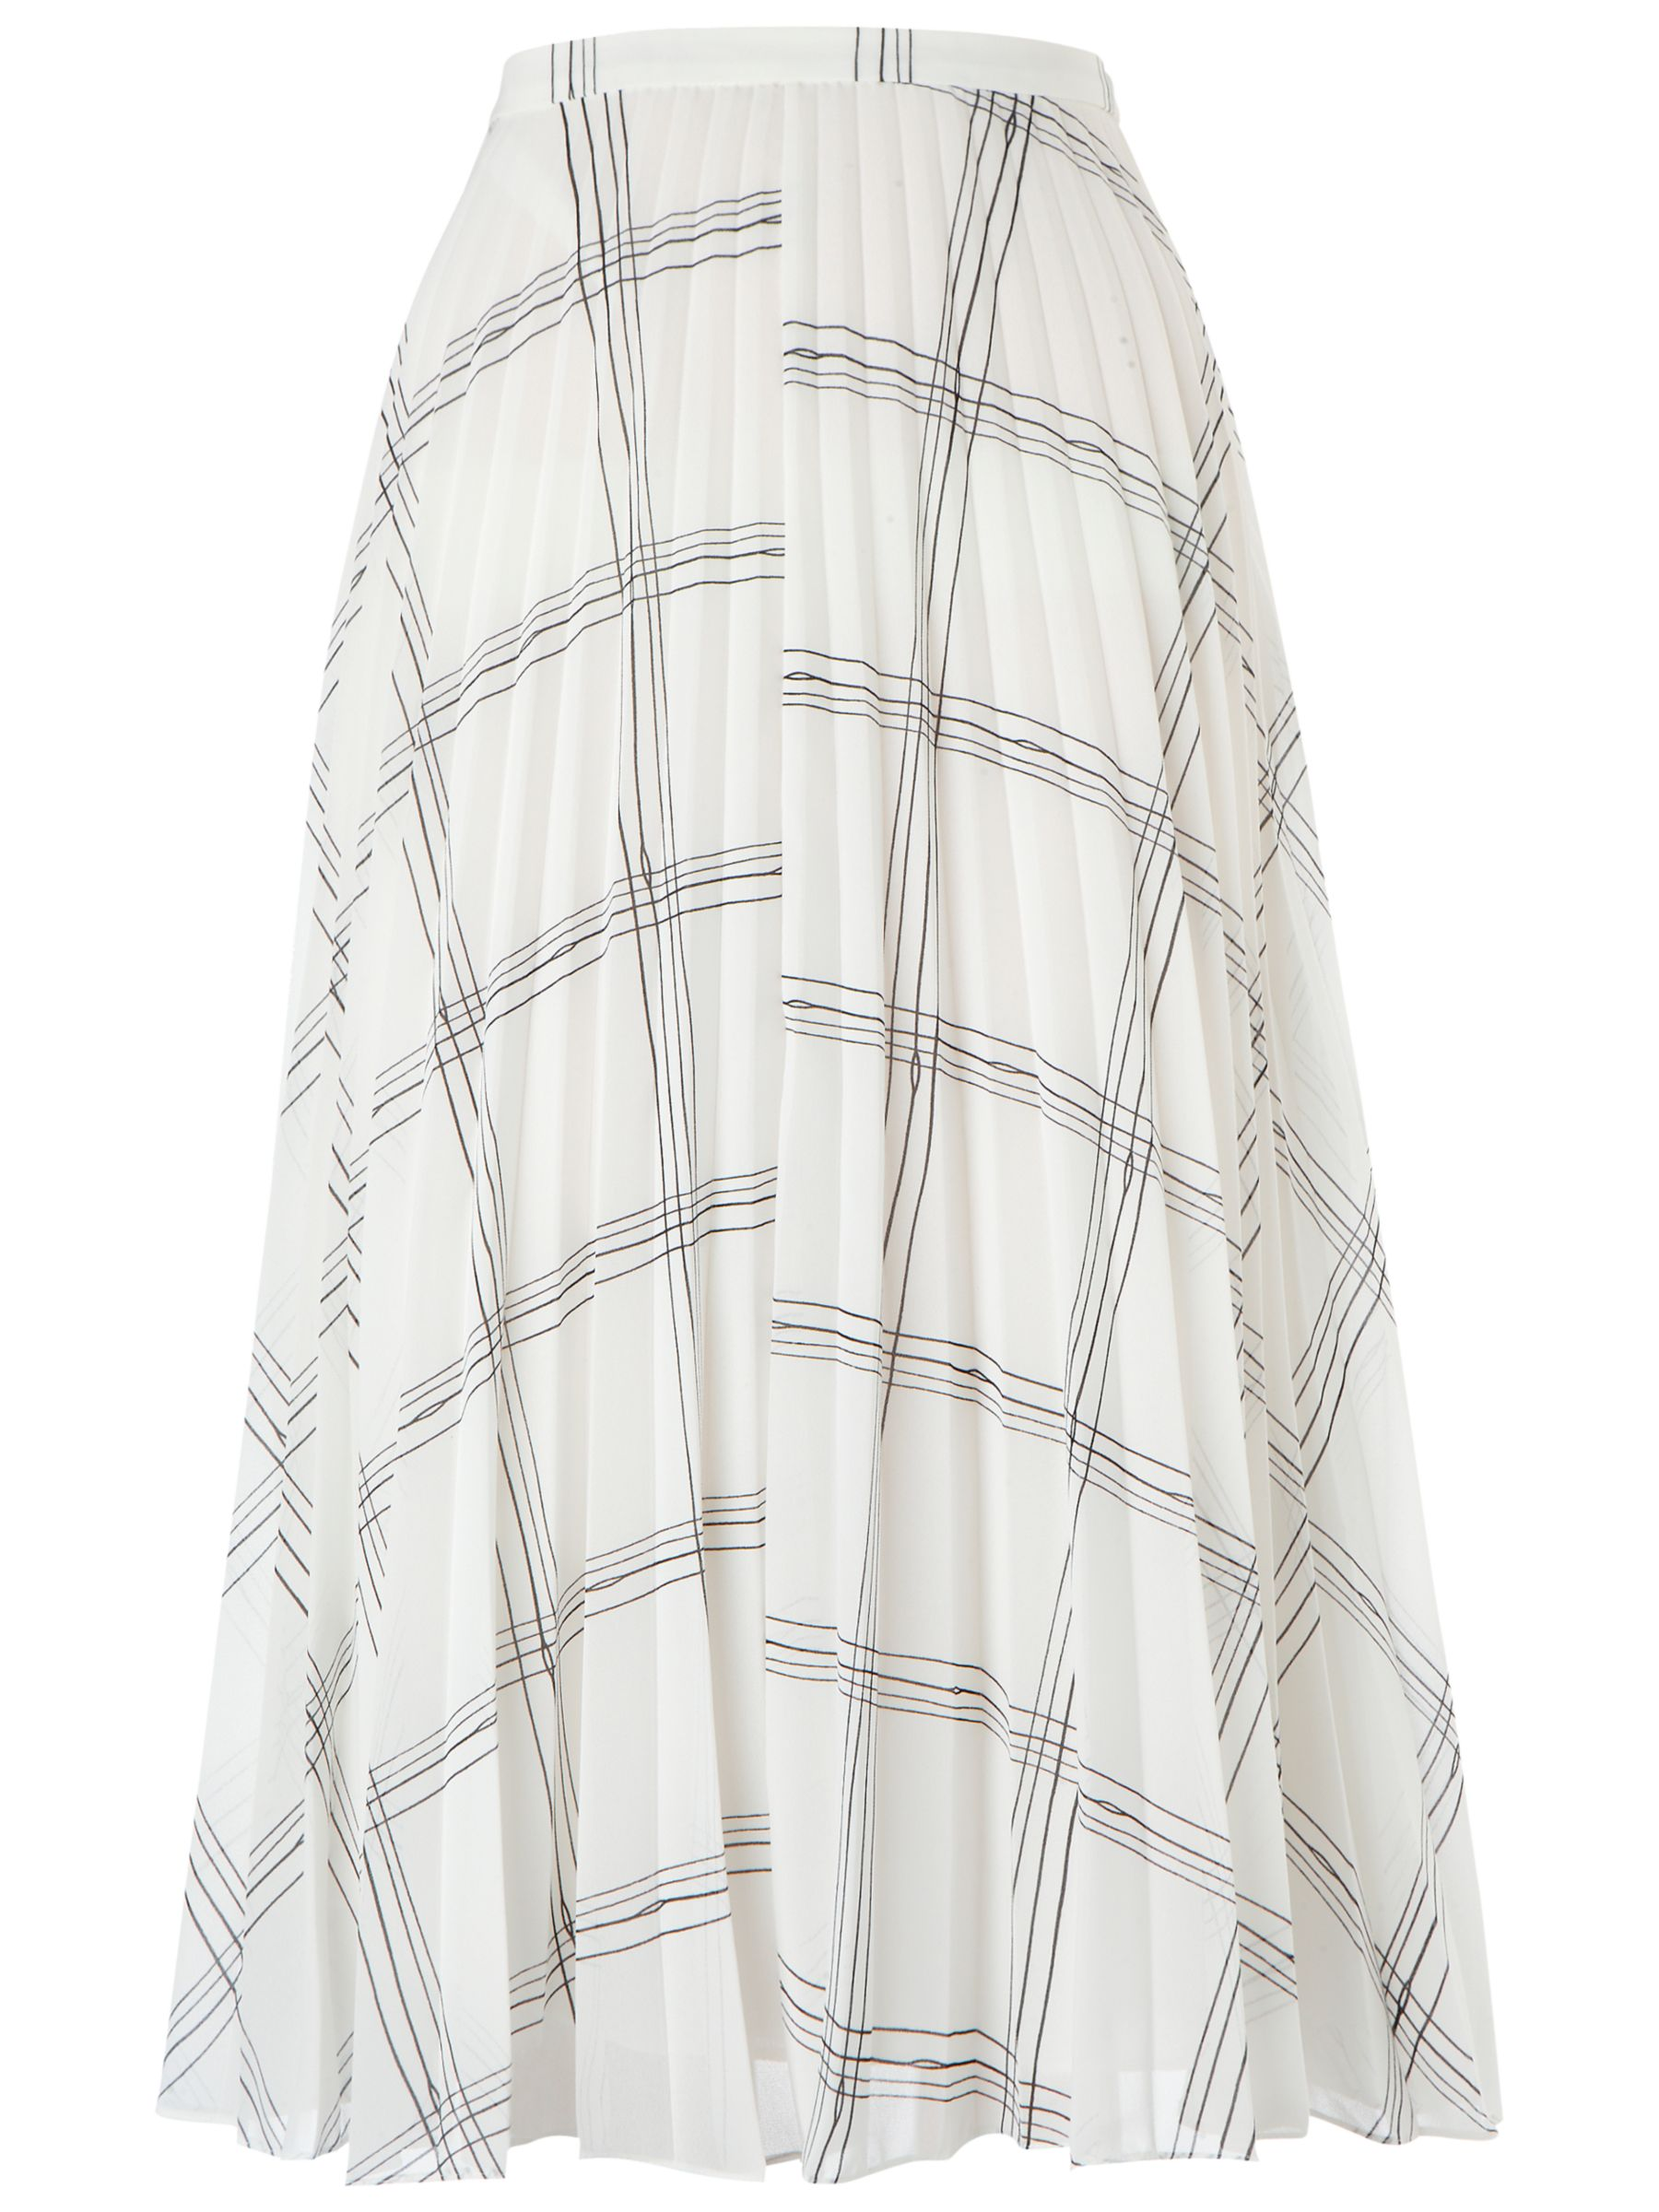 60dfaf0db9 Whistles Ellie Grid Print Pleated Skirt, Black/White at John Lewis ...